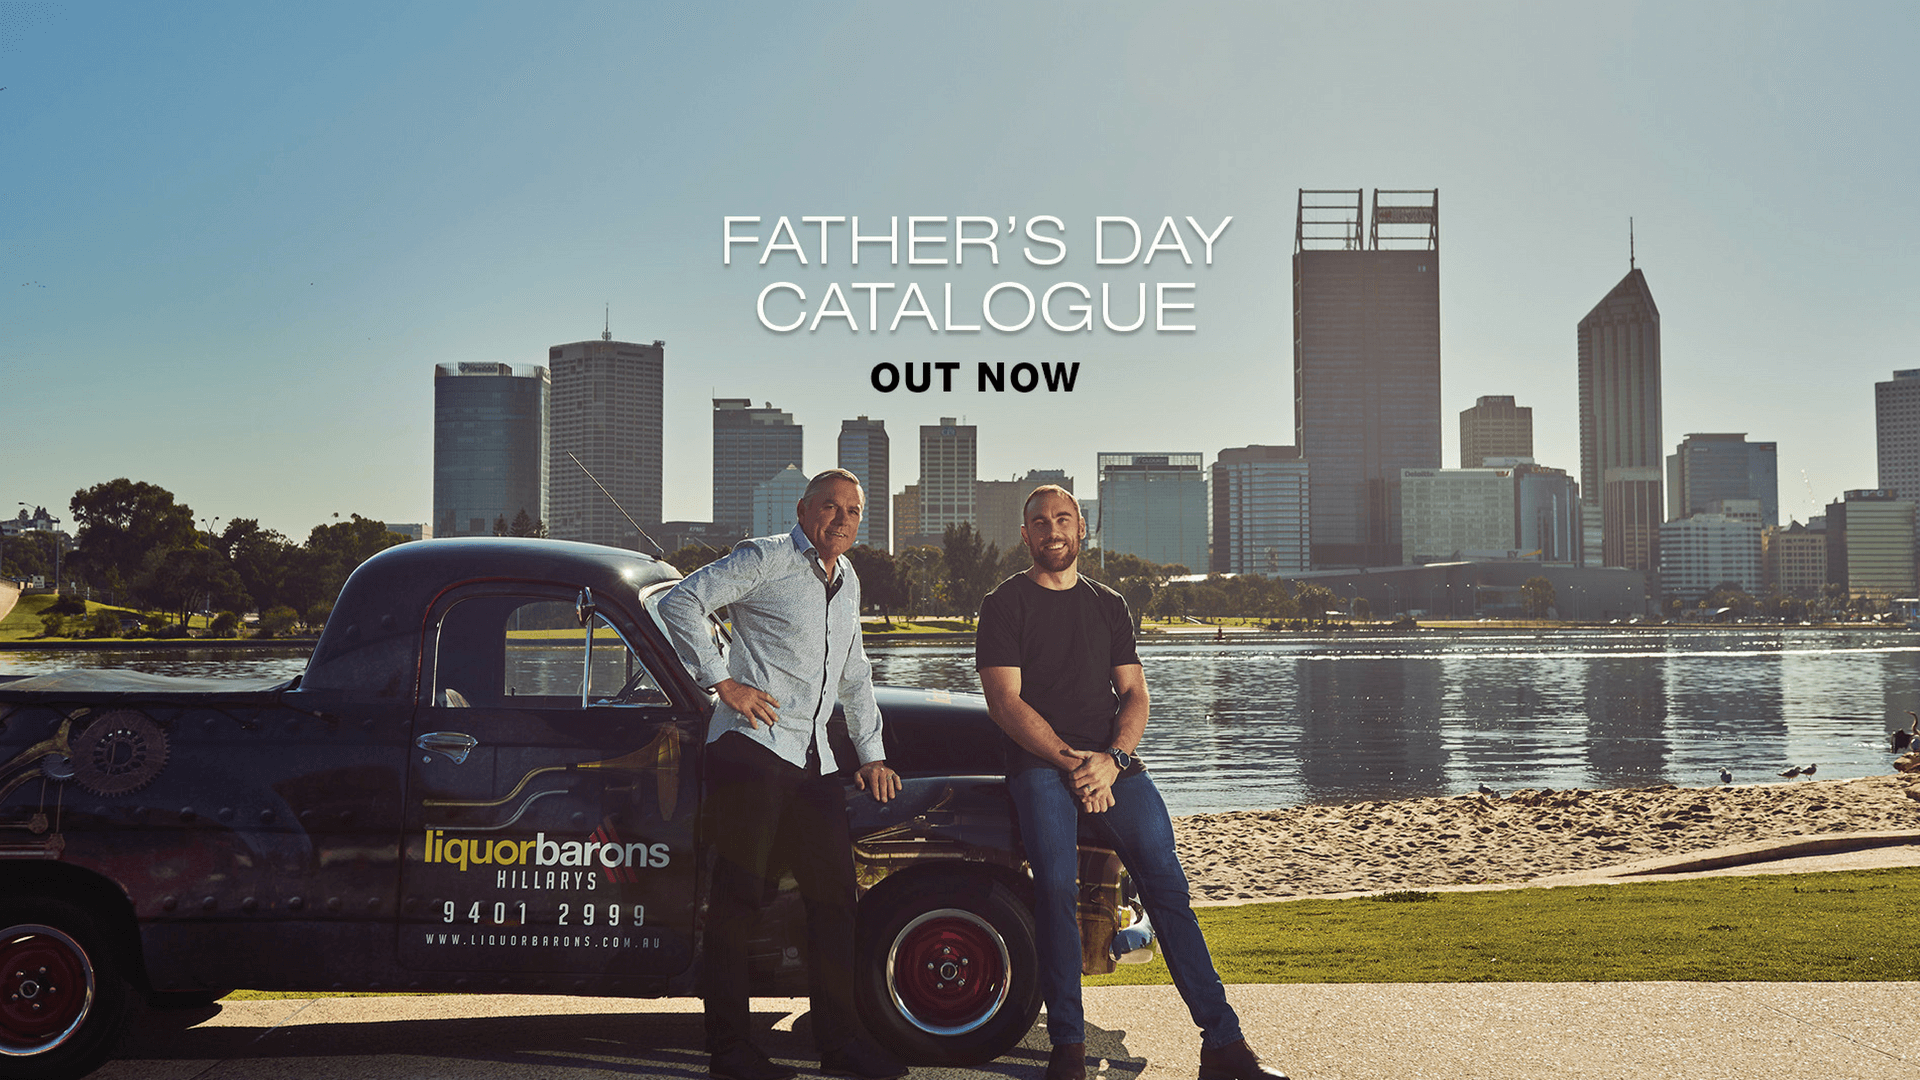 liquor-barons-hillarys-fathers-day-catalogue.png